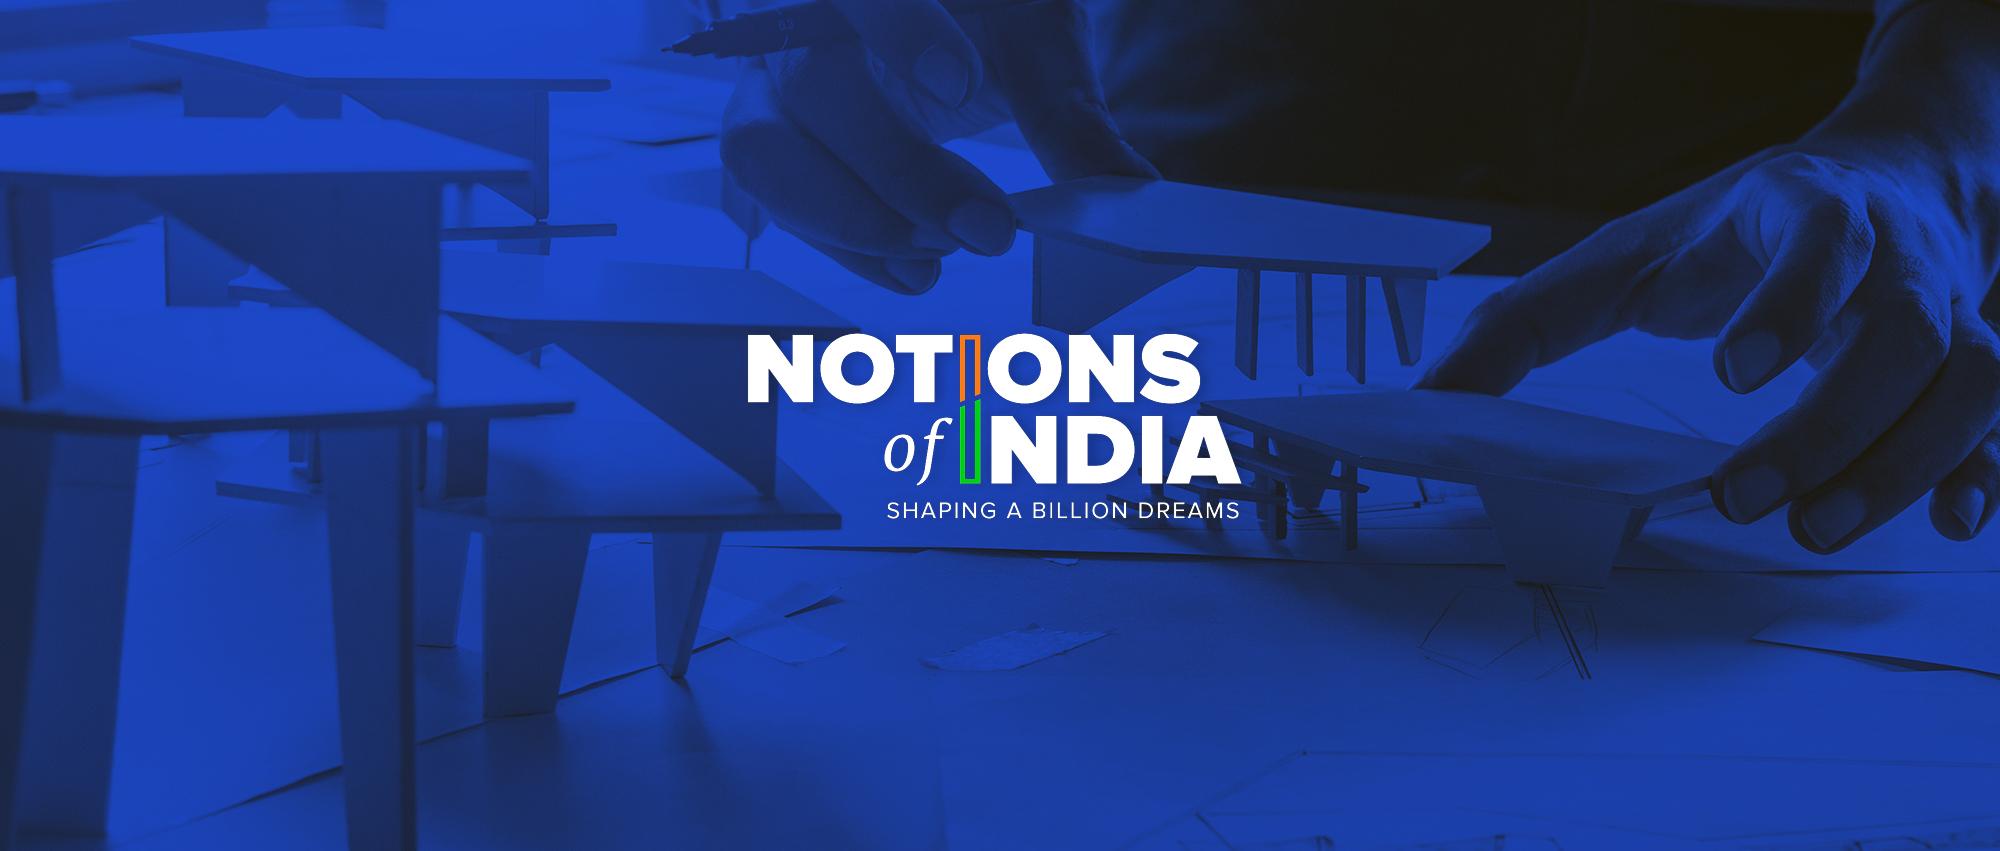 2021 Tata 雕塑设计竞赛:印度的信念(Notions Of India)